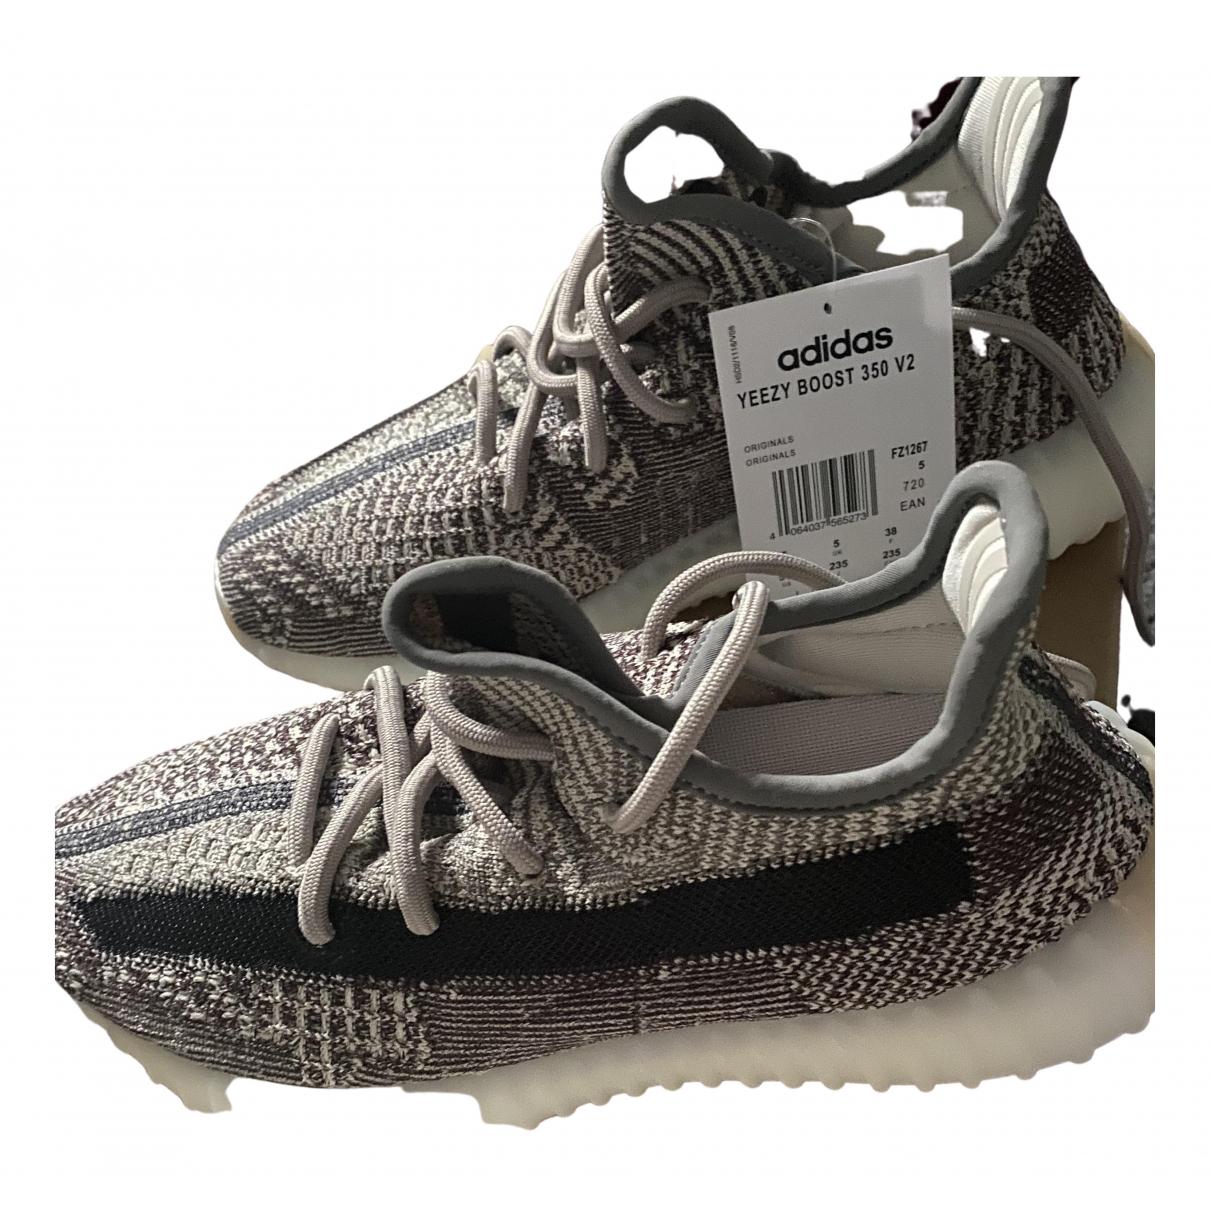 Yeezy X Adidas Boost 350 V2 Grey Cloth Trainers for Women 38 EU